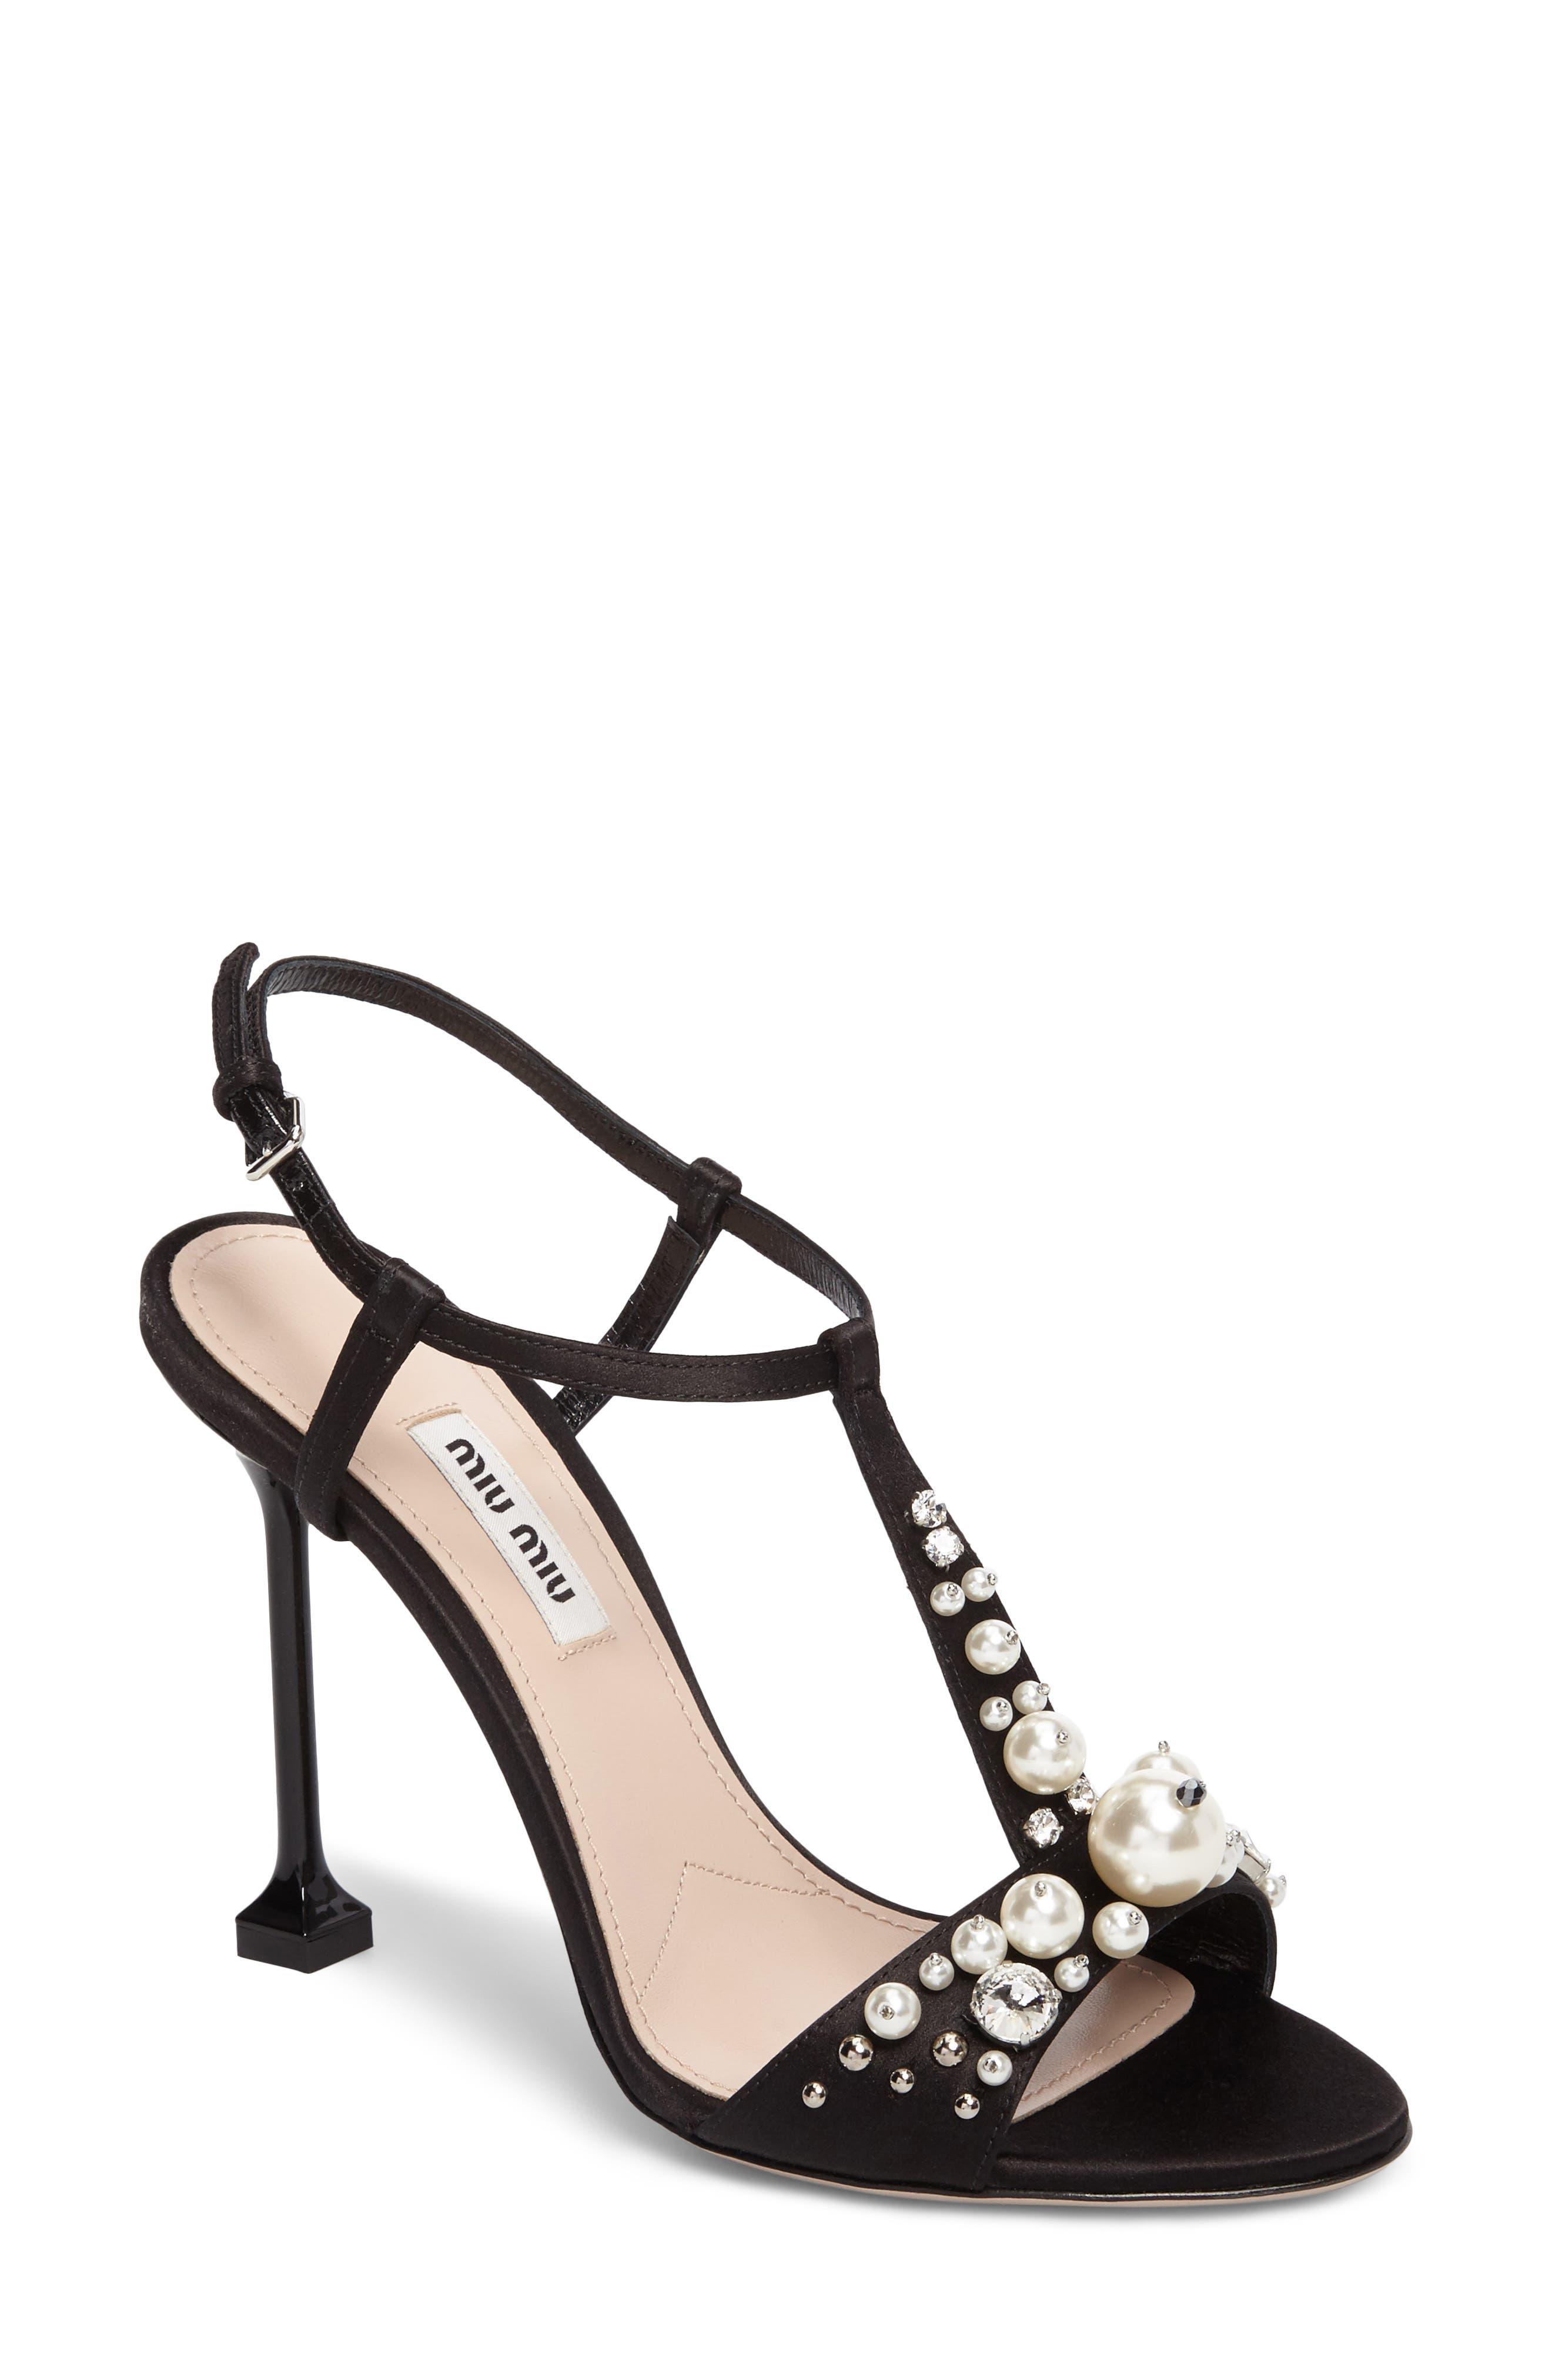 Alternate Image 1 Selected - Miu Miu Embellished T-Strap Sandal (Women)